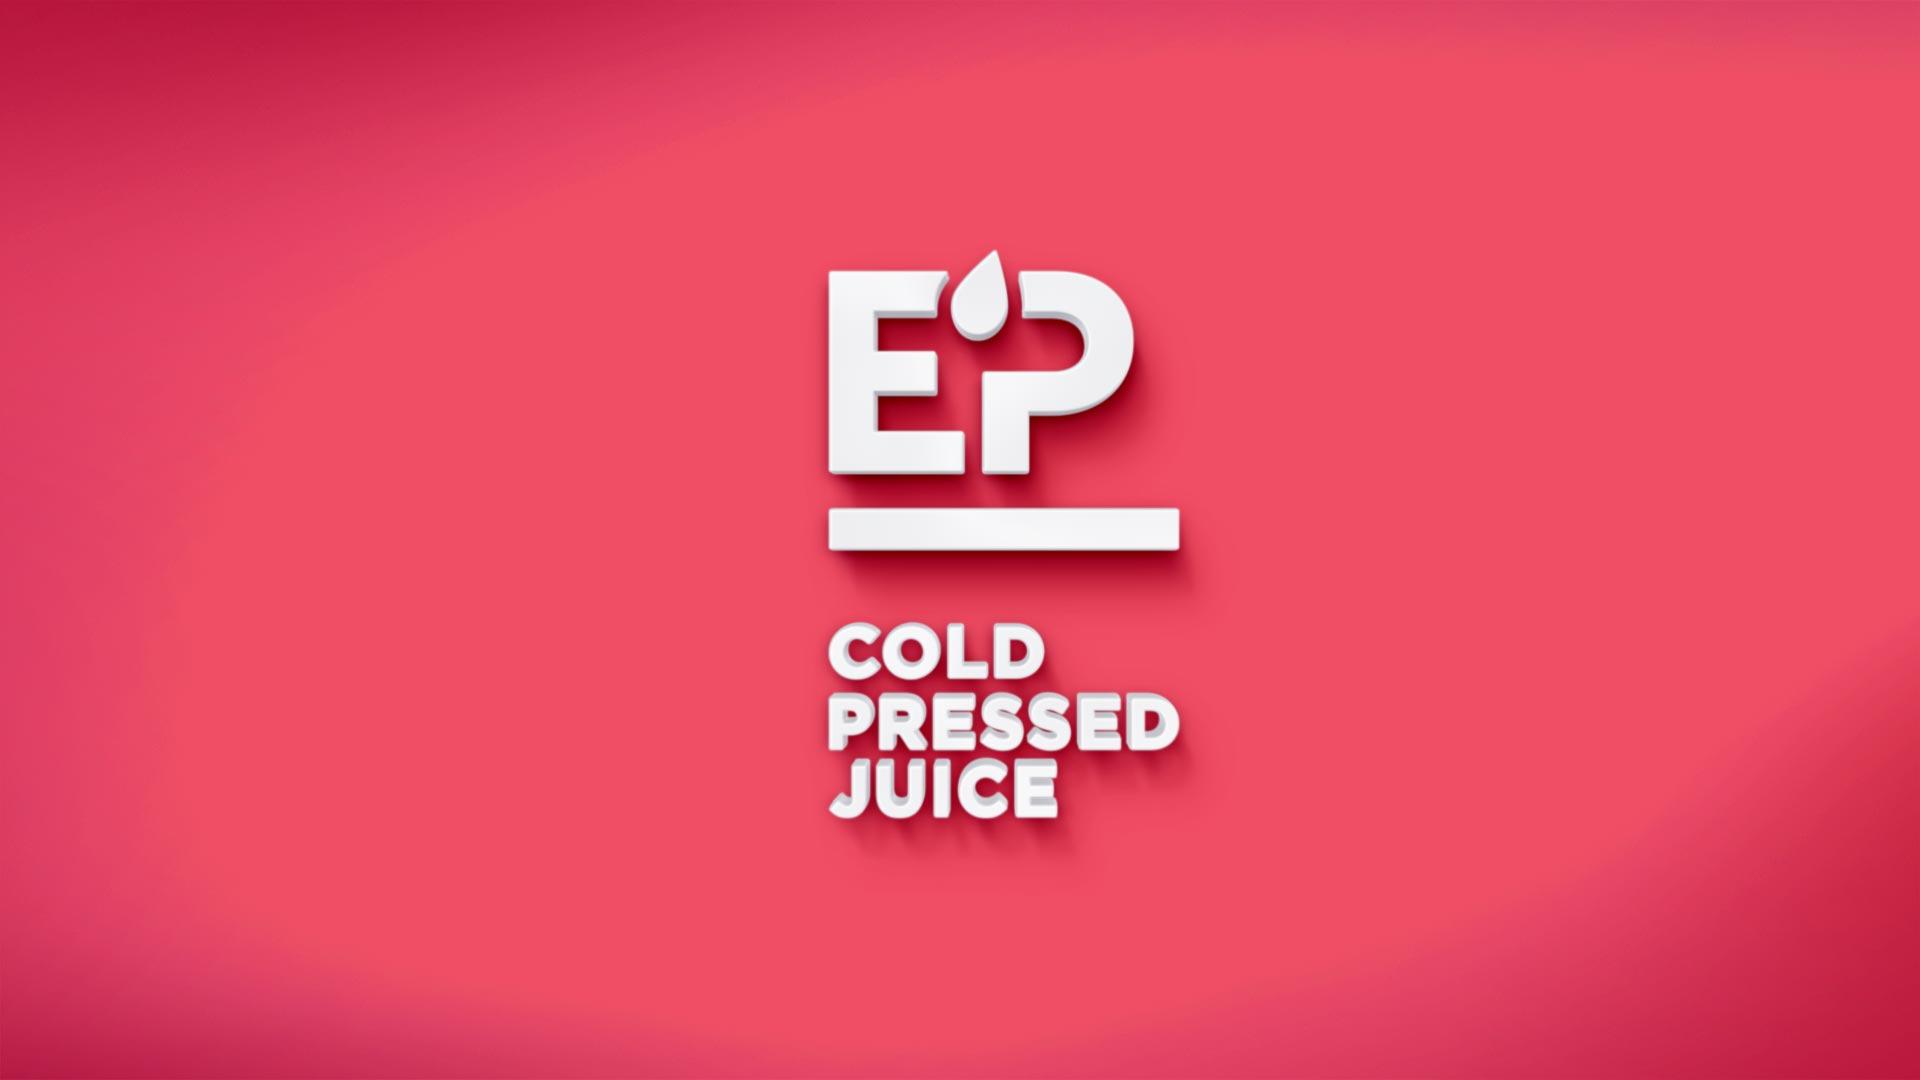 EP Pressed Juice logo 3D